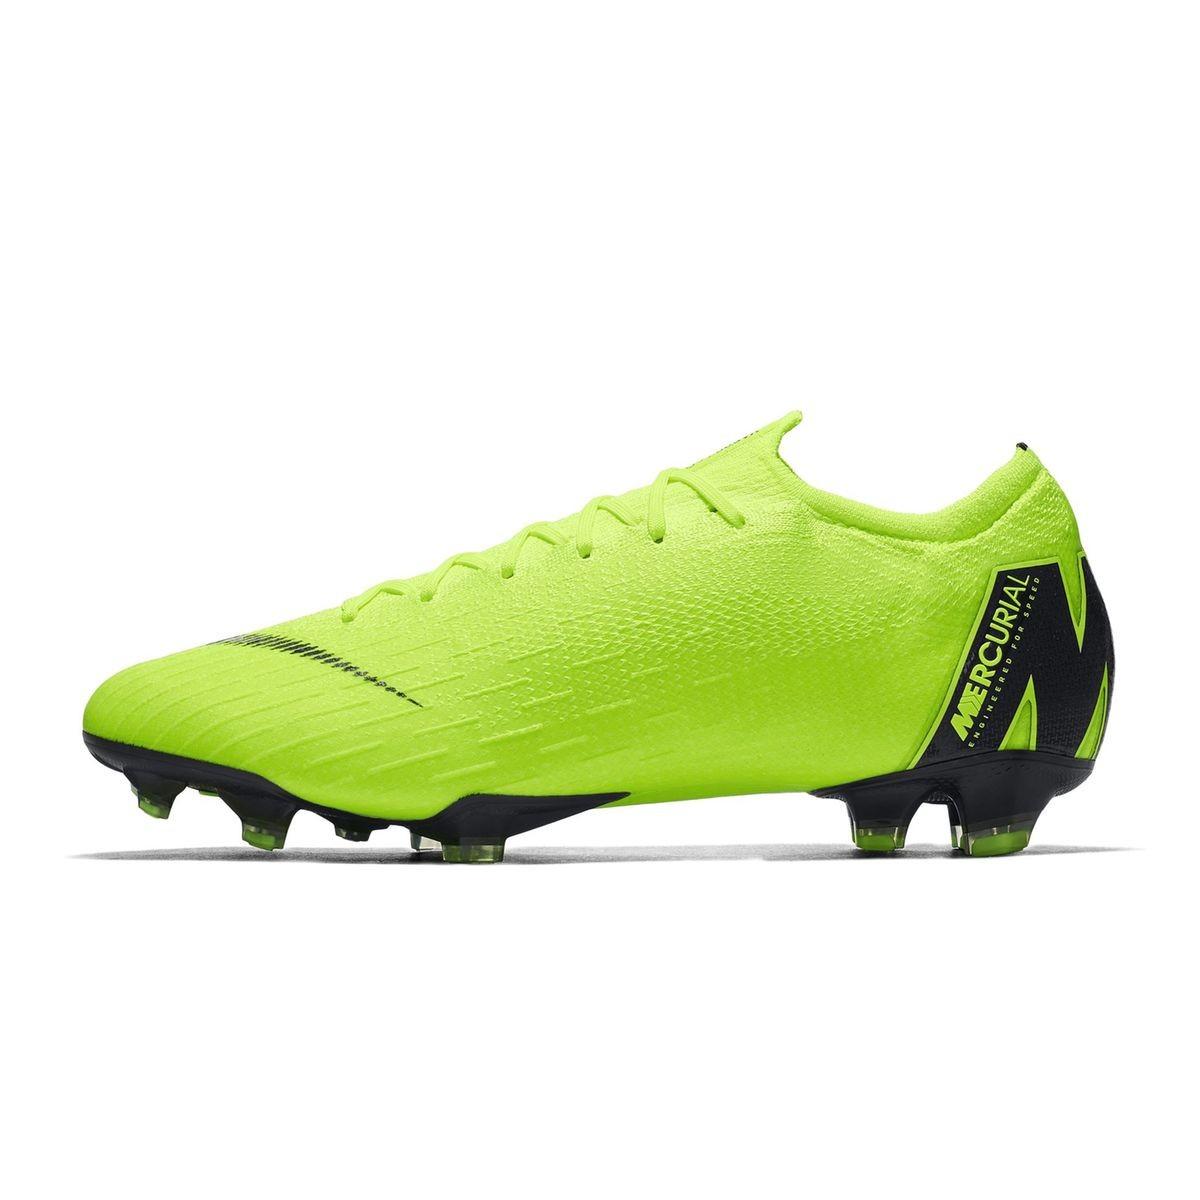 Chaussures Football Nike Mercurial Vapor Xii 360 Elite Fg